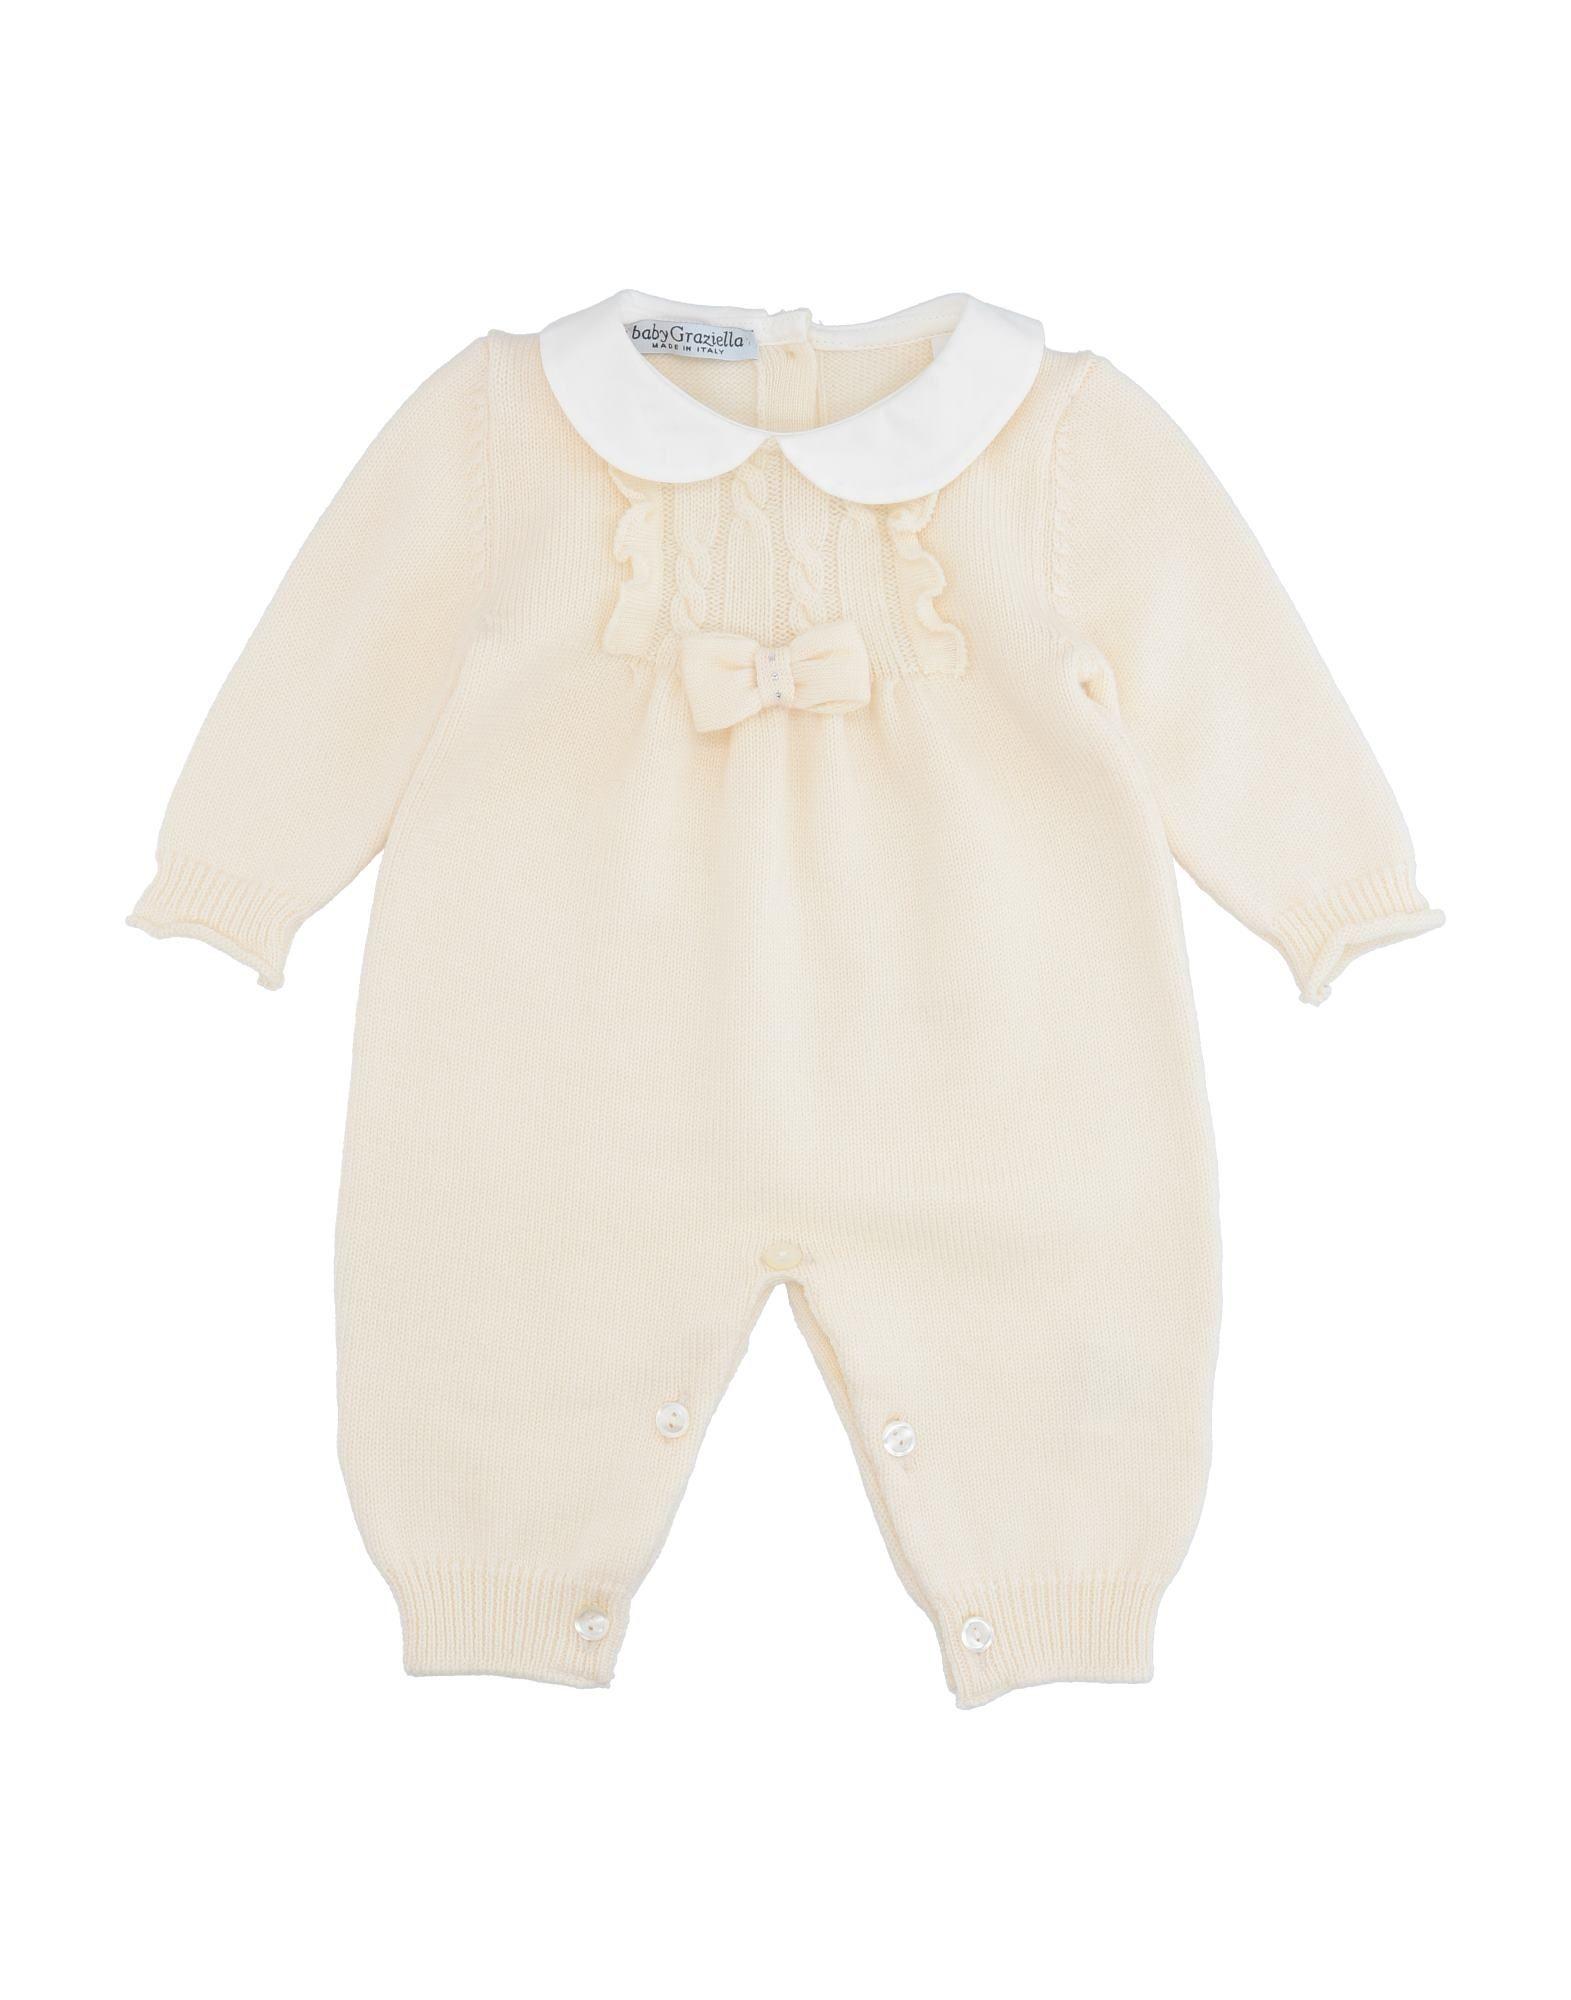 YOOX.COM(ユークス)《セール開催中》BABY GRAZIELLA ガールズ 0-24 ヶ月 乳幼児用ロンパース アイボリー 3 ウール 100%